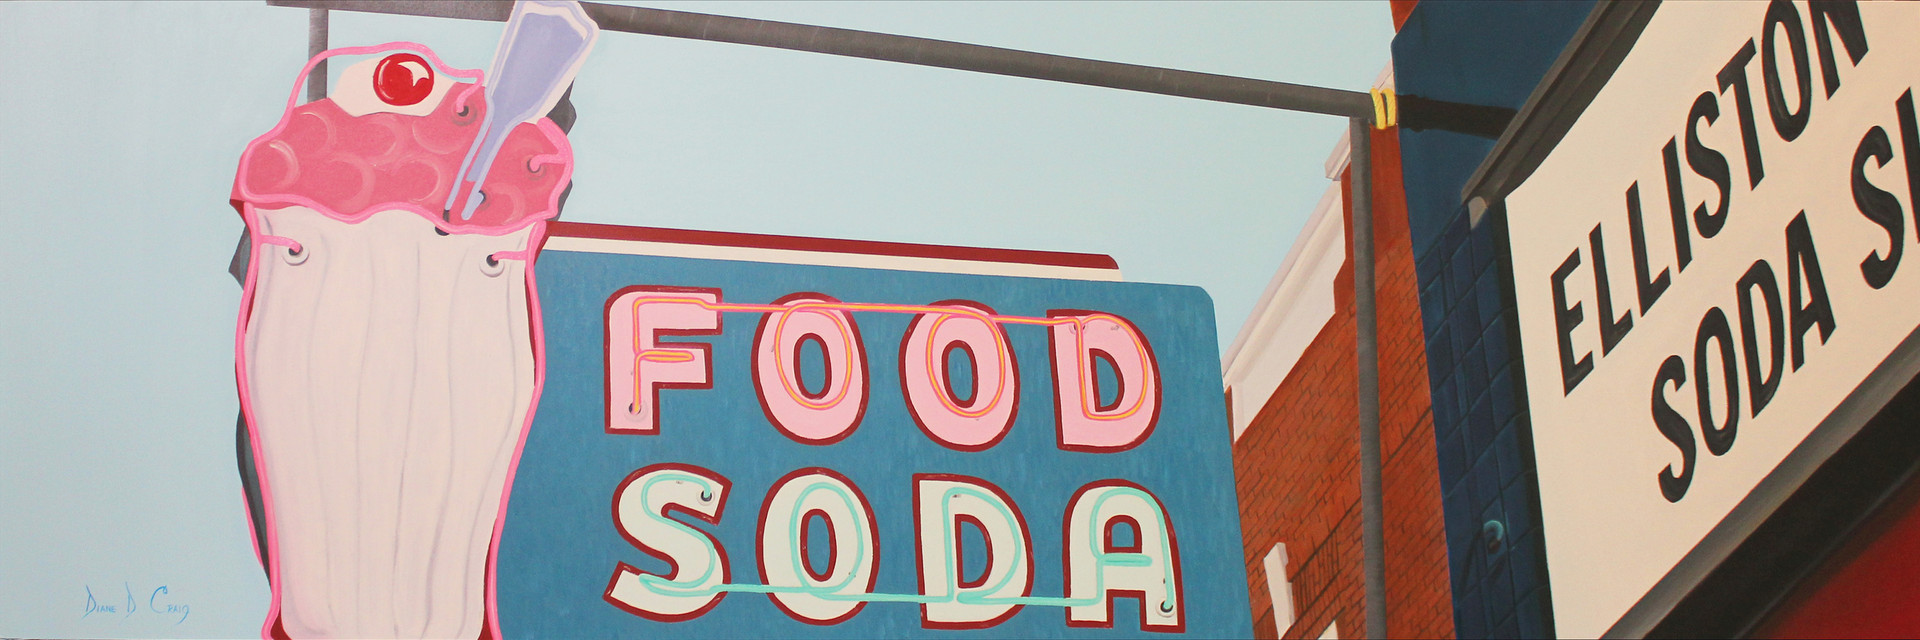 Elliston Place Soda Shop #2